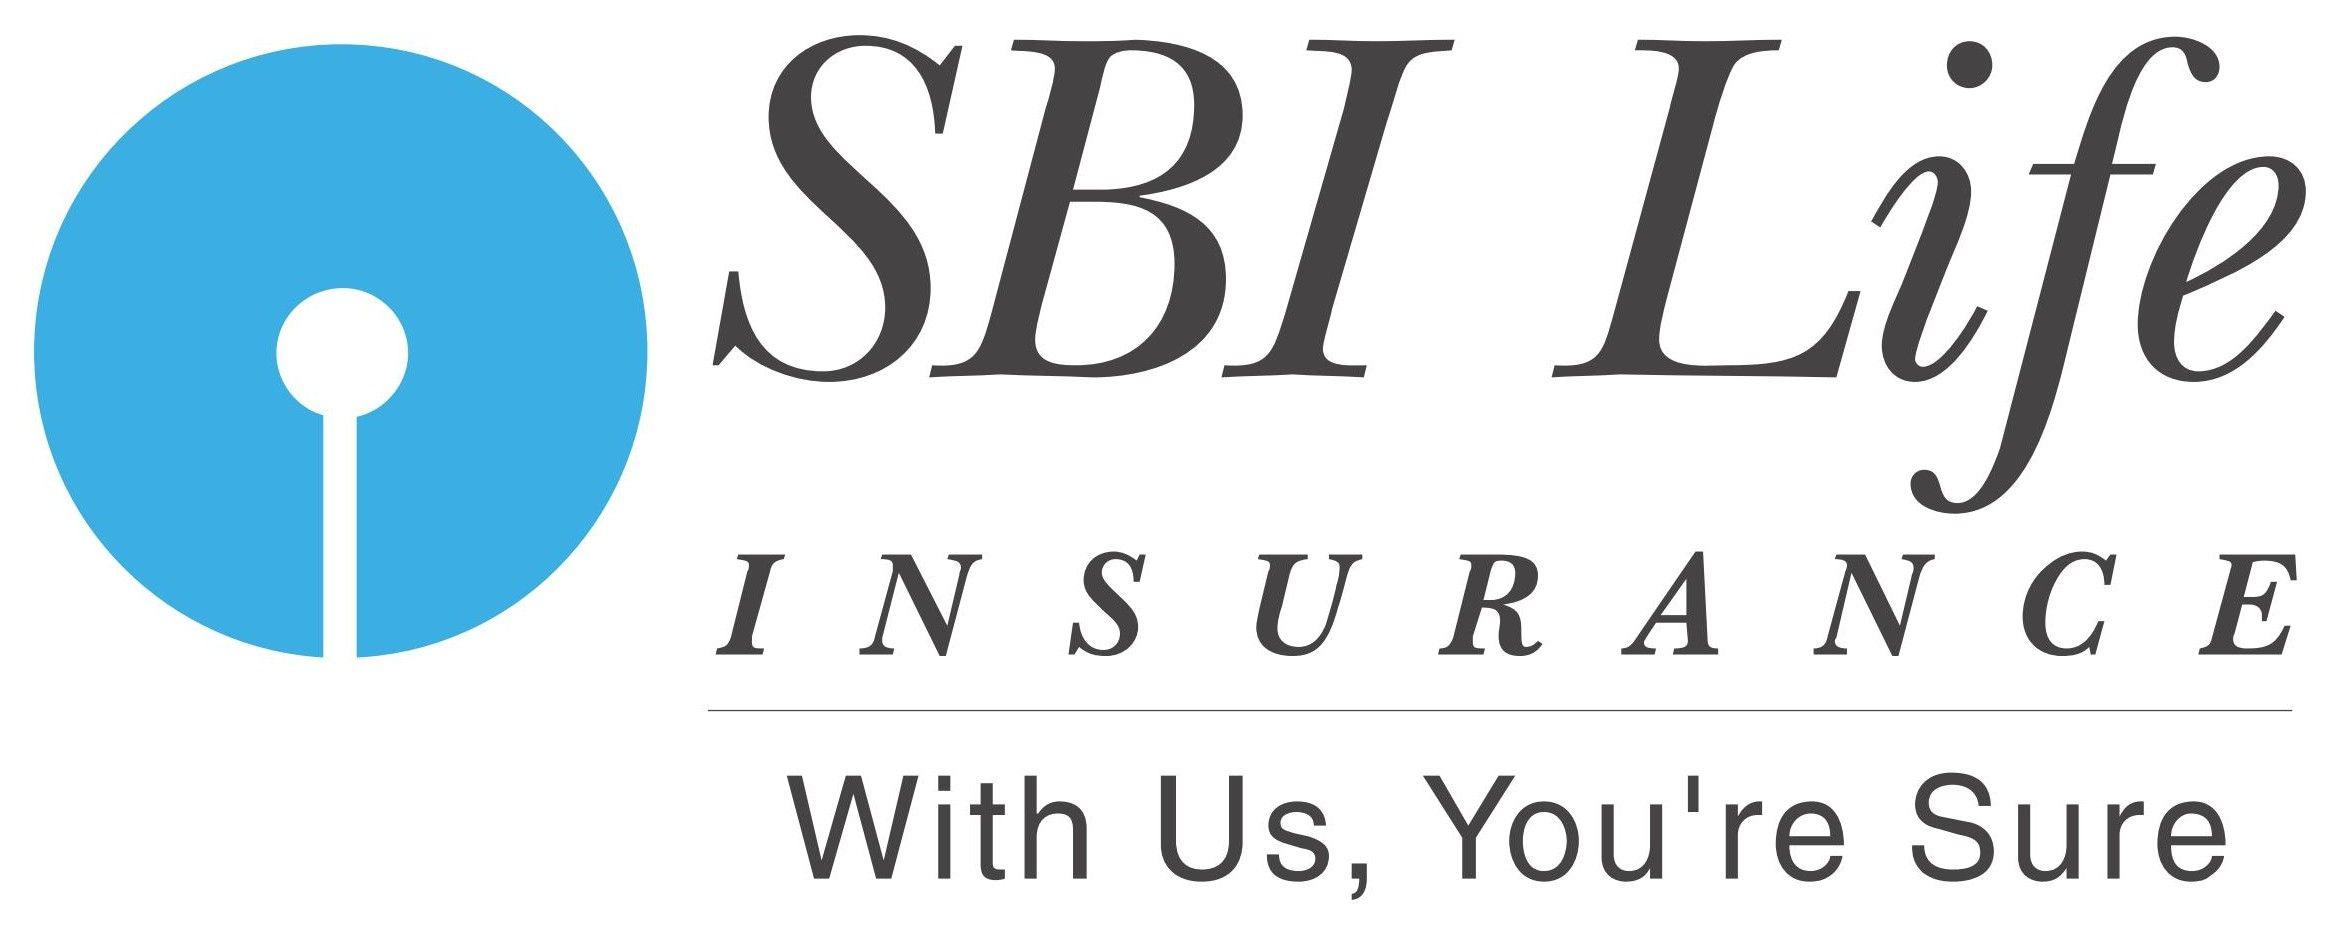 Sbi Life Life Insurance Companies Life Insurance Policy Life